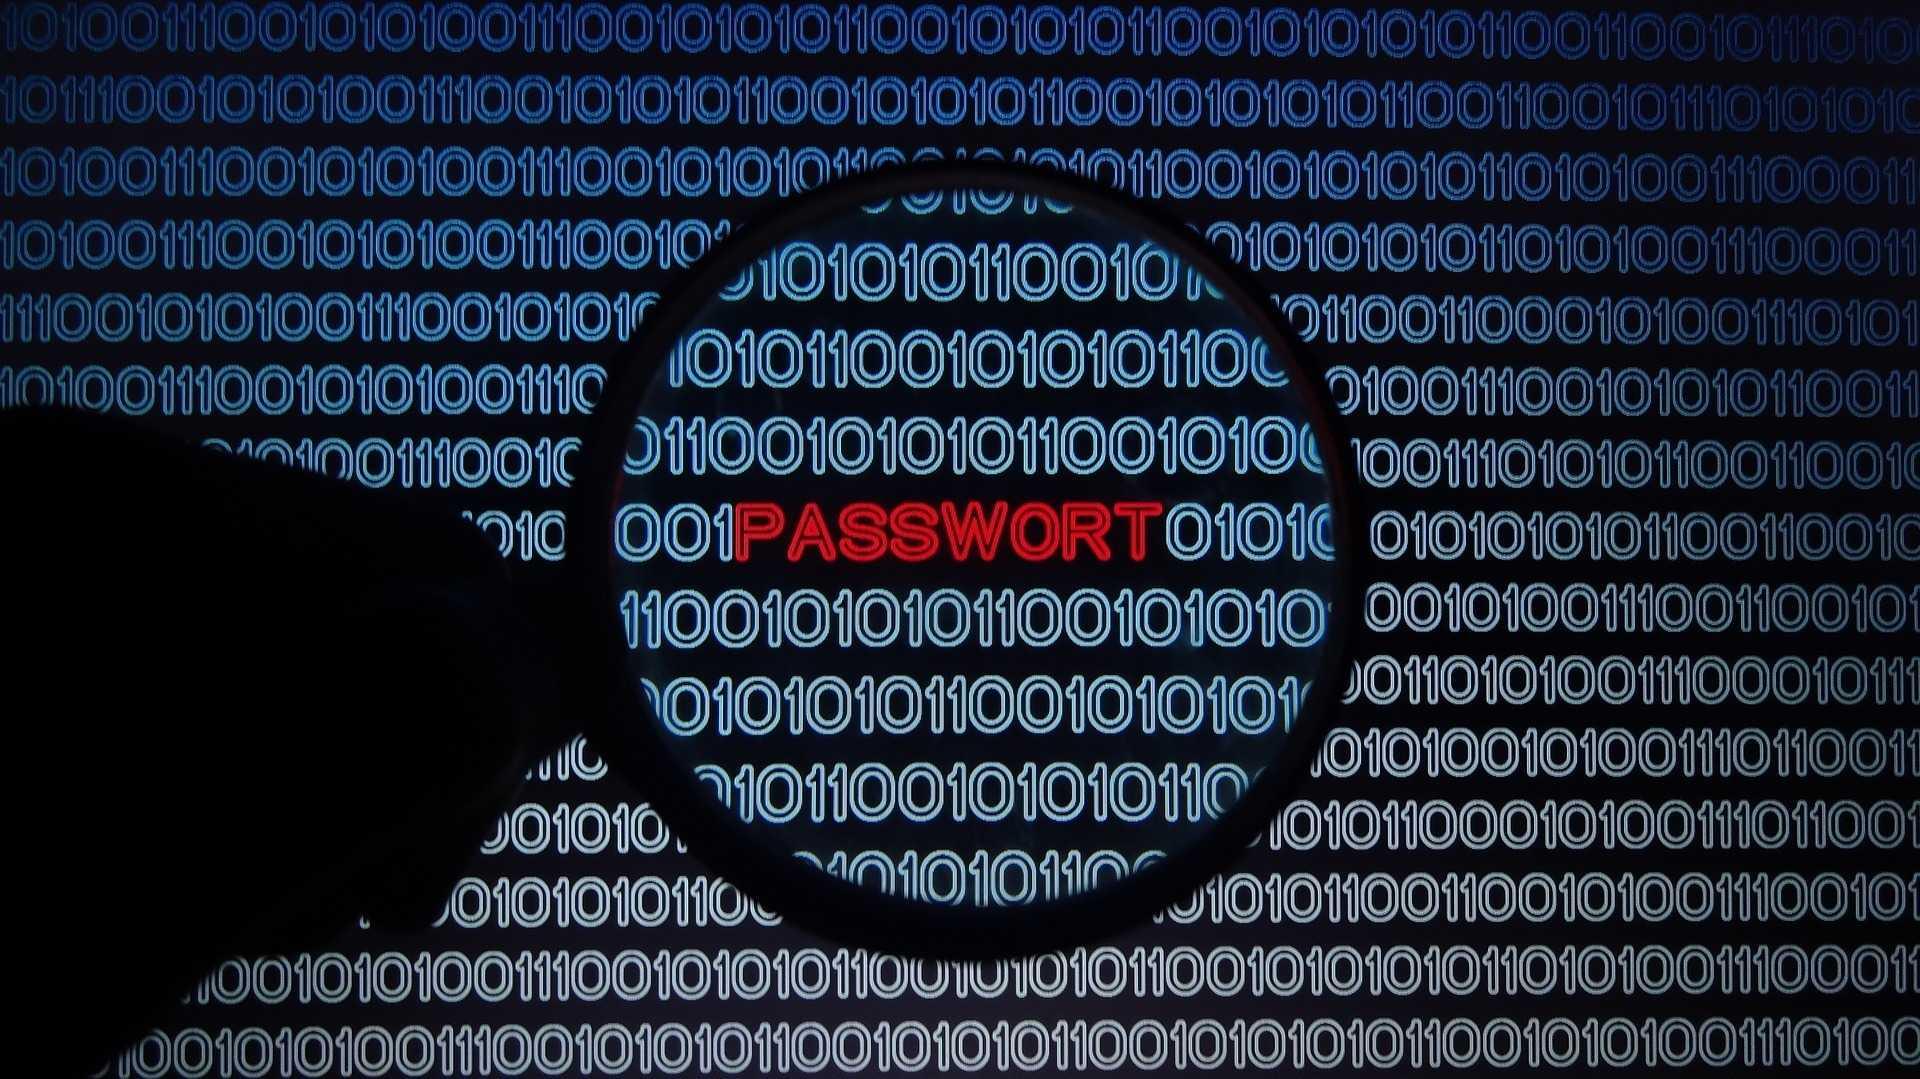 Erneut Keylogger auf HP-Notebooks entdeckt